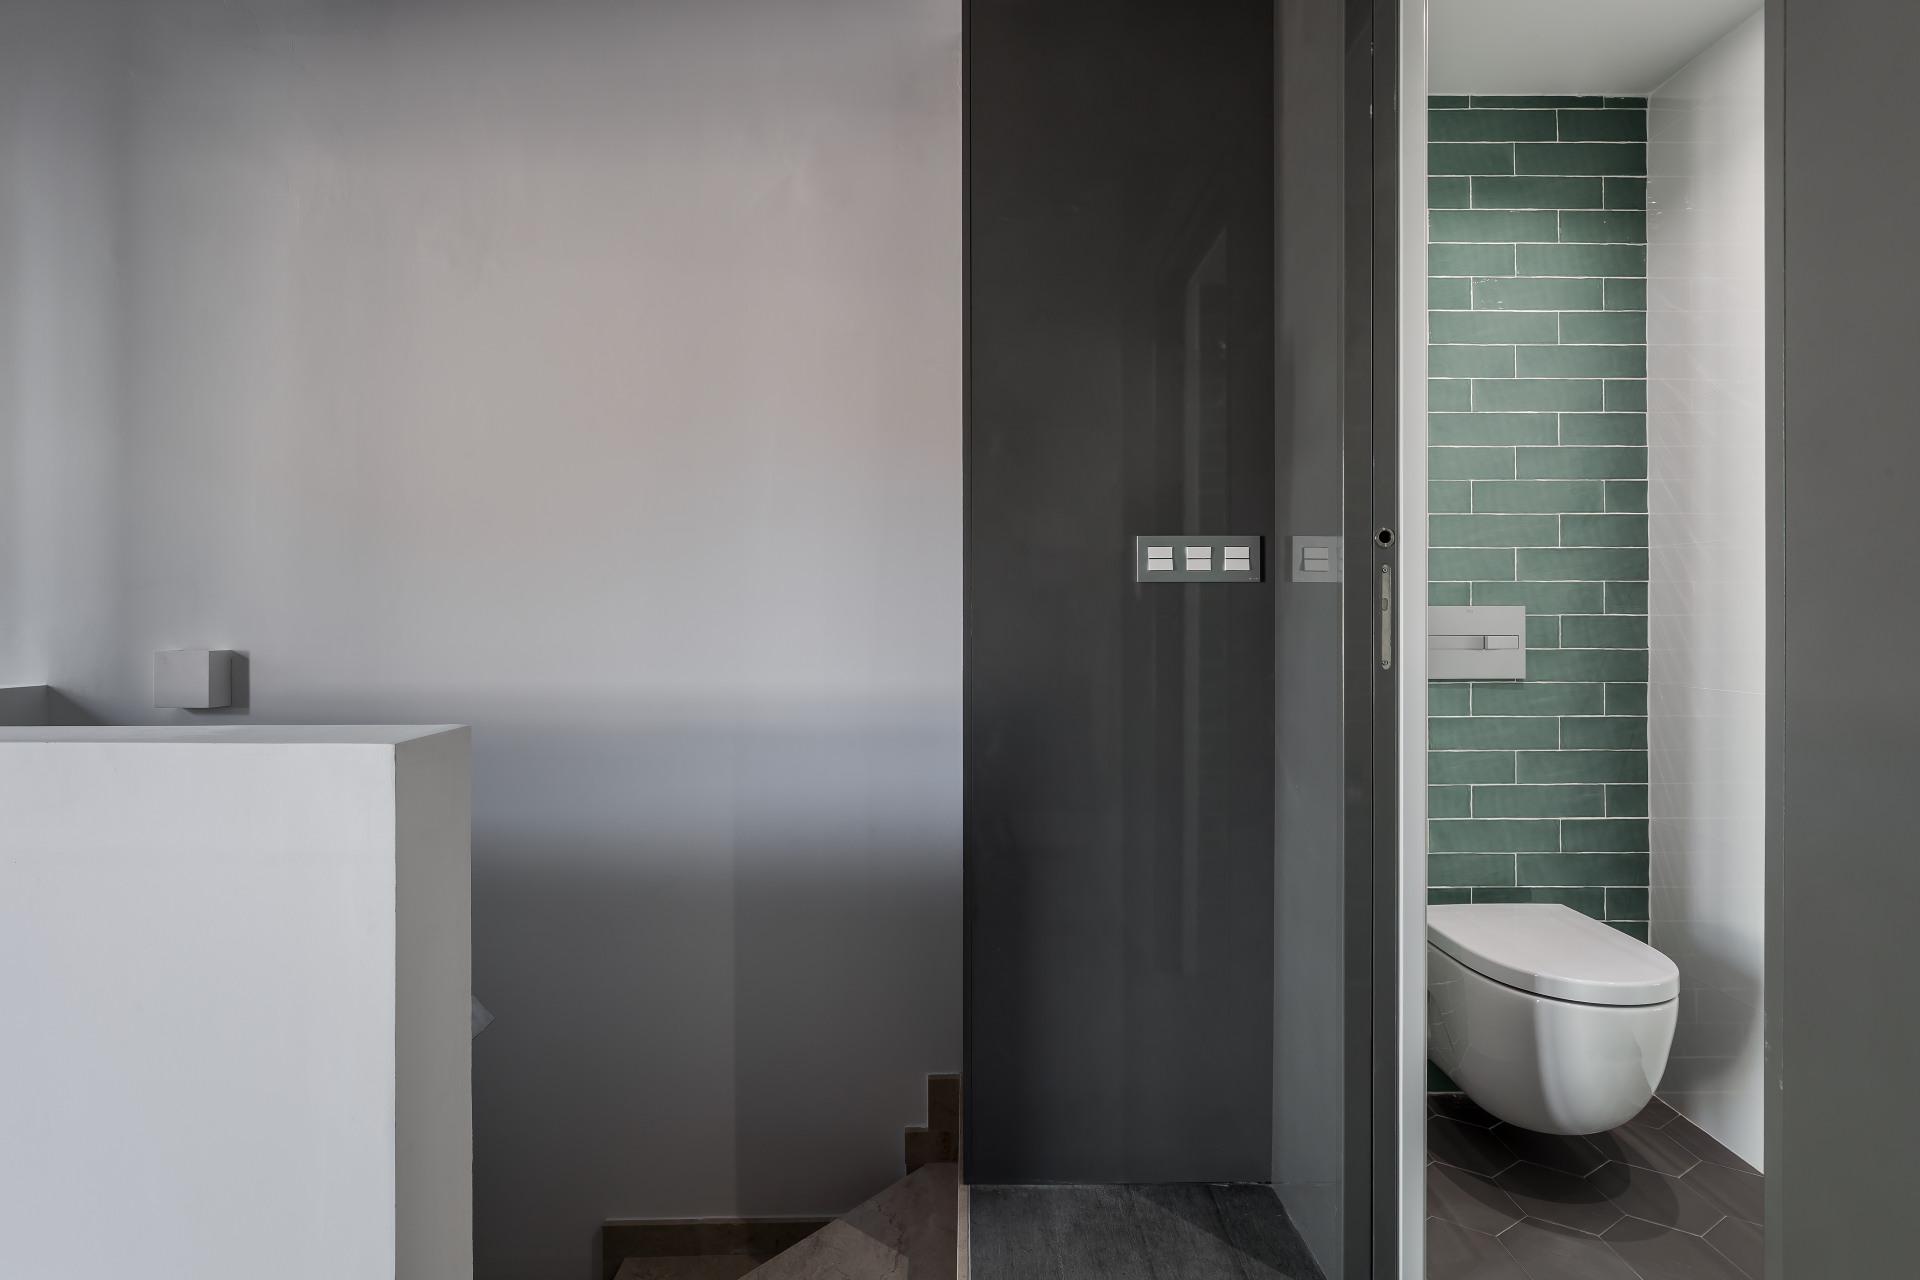 fotografia-arquitectura-valencia-german-cabo-viraje-reforma-campanar (3)